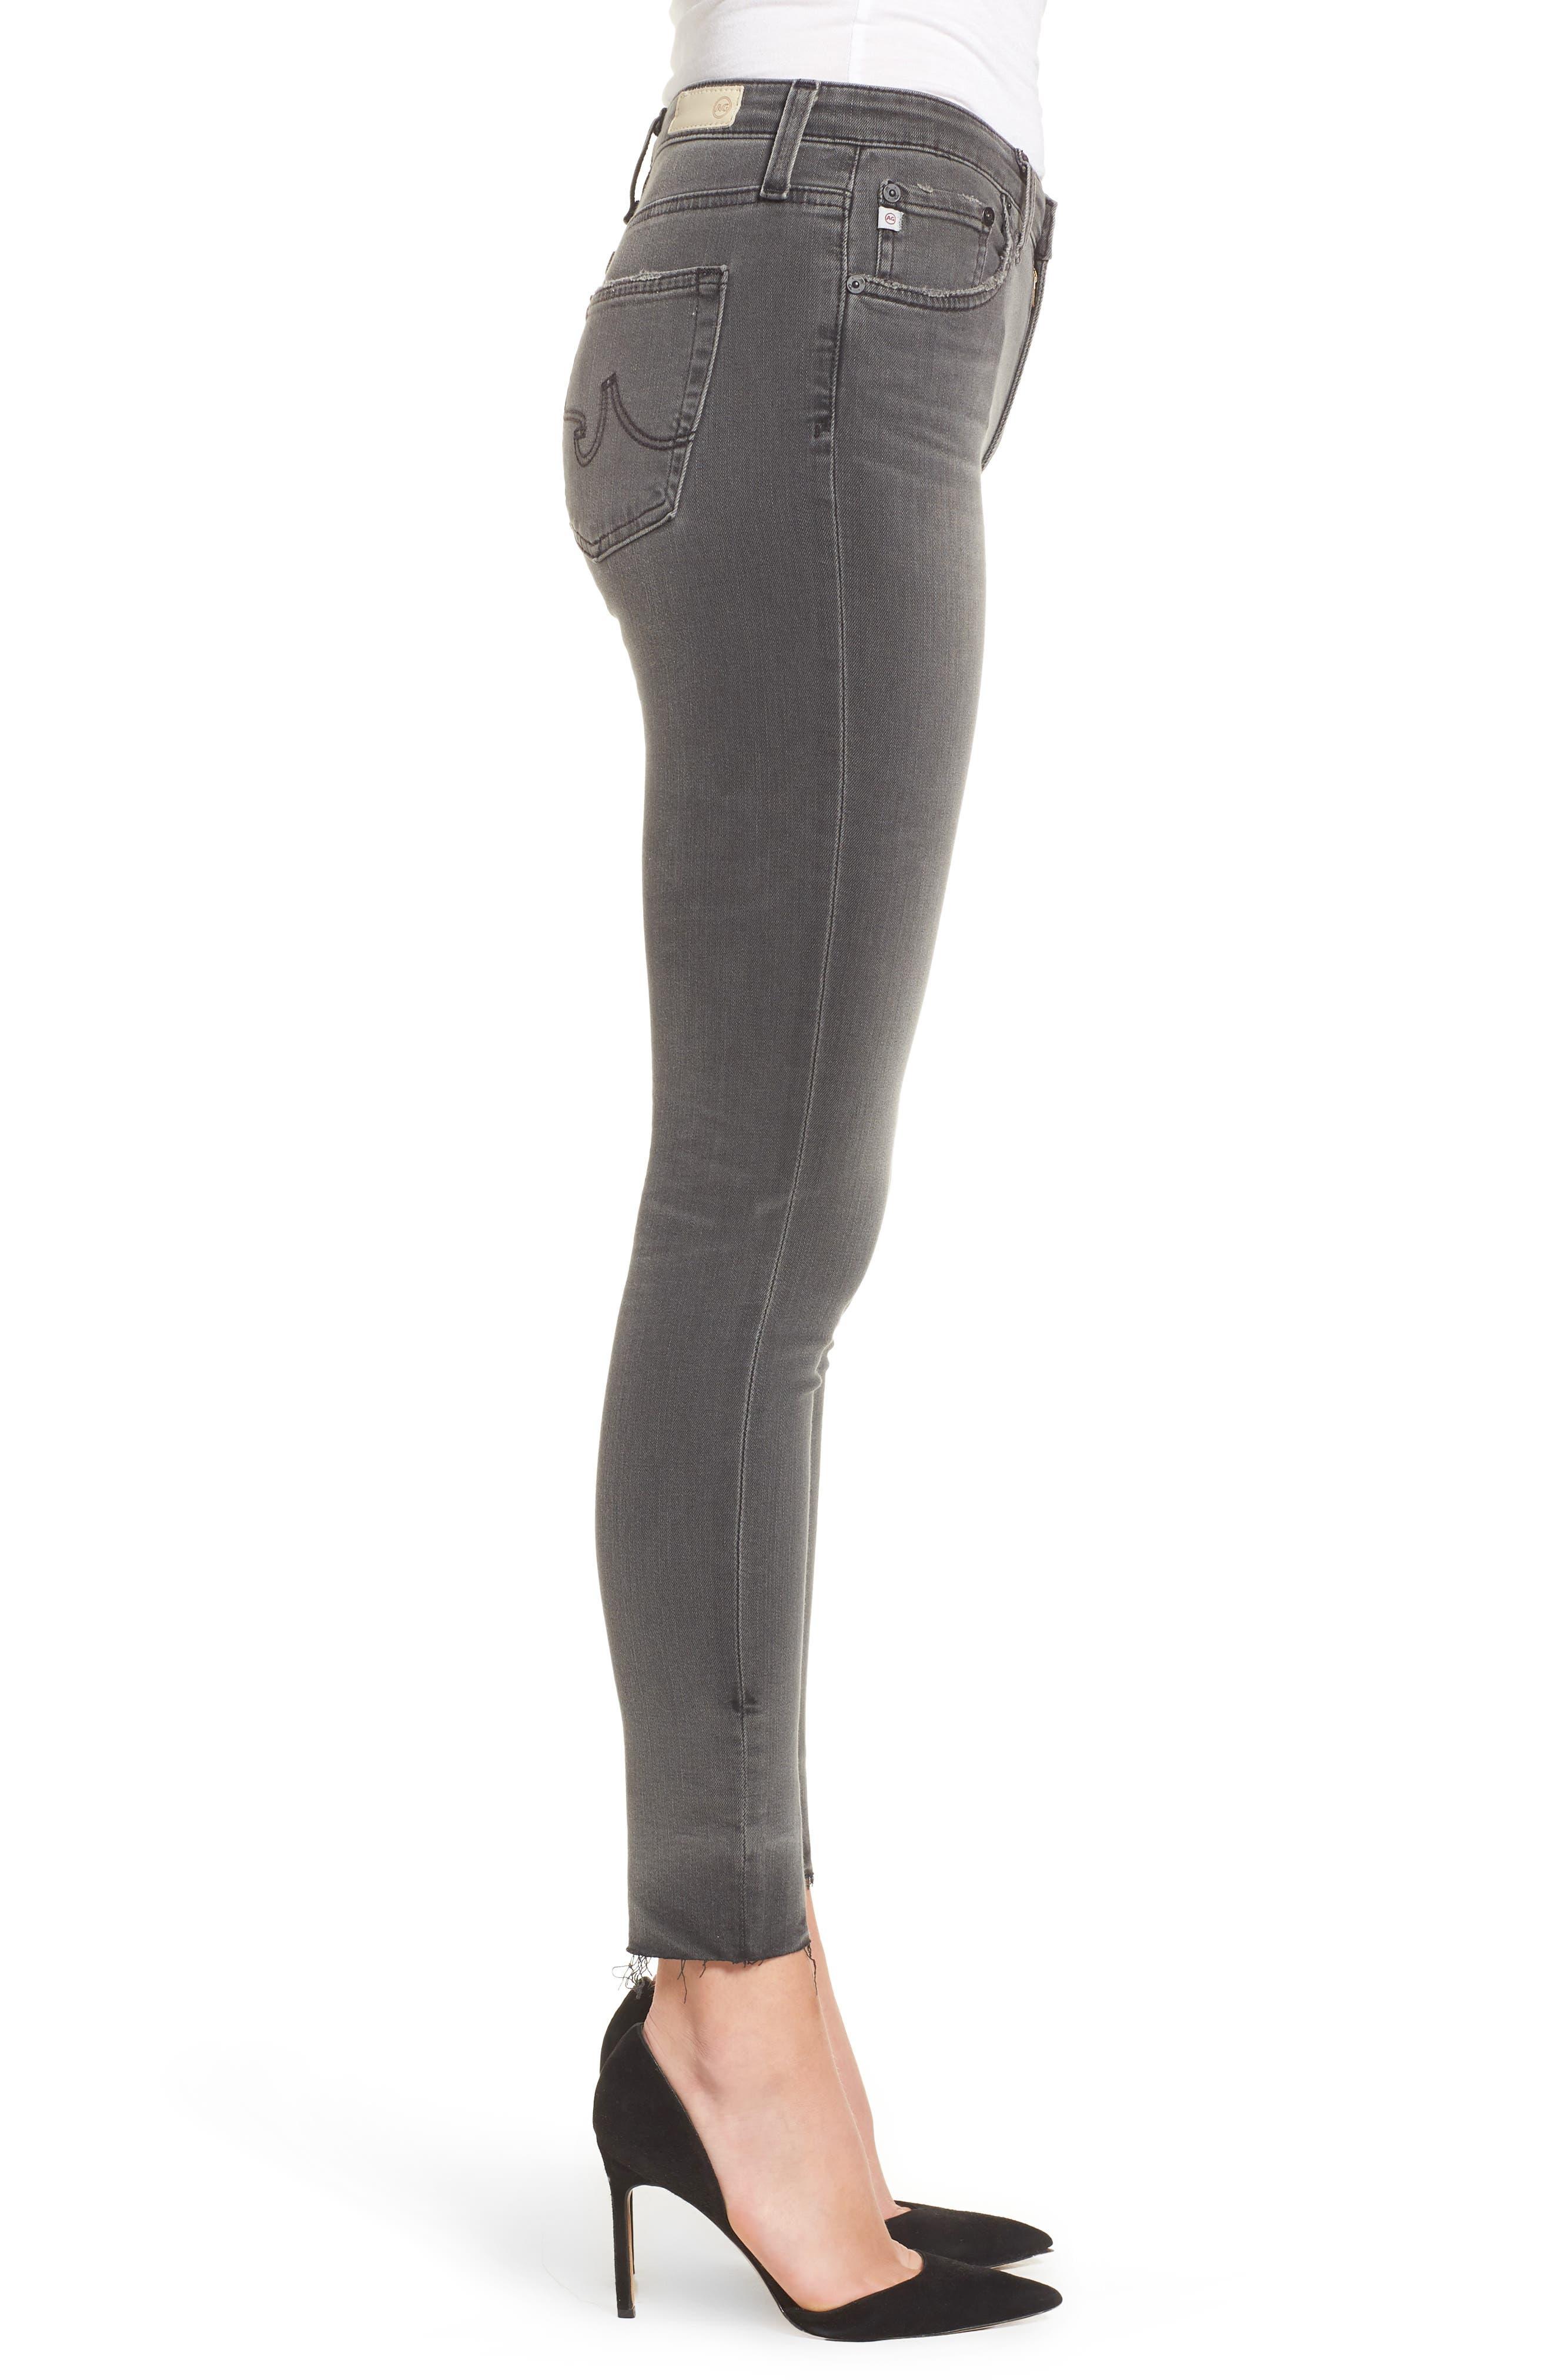 The Farrah High Waist Raw Hem Skinny Jeans,                             Alternate thumbnail 3, color,                             12 Years-Shadow Ash